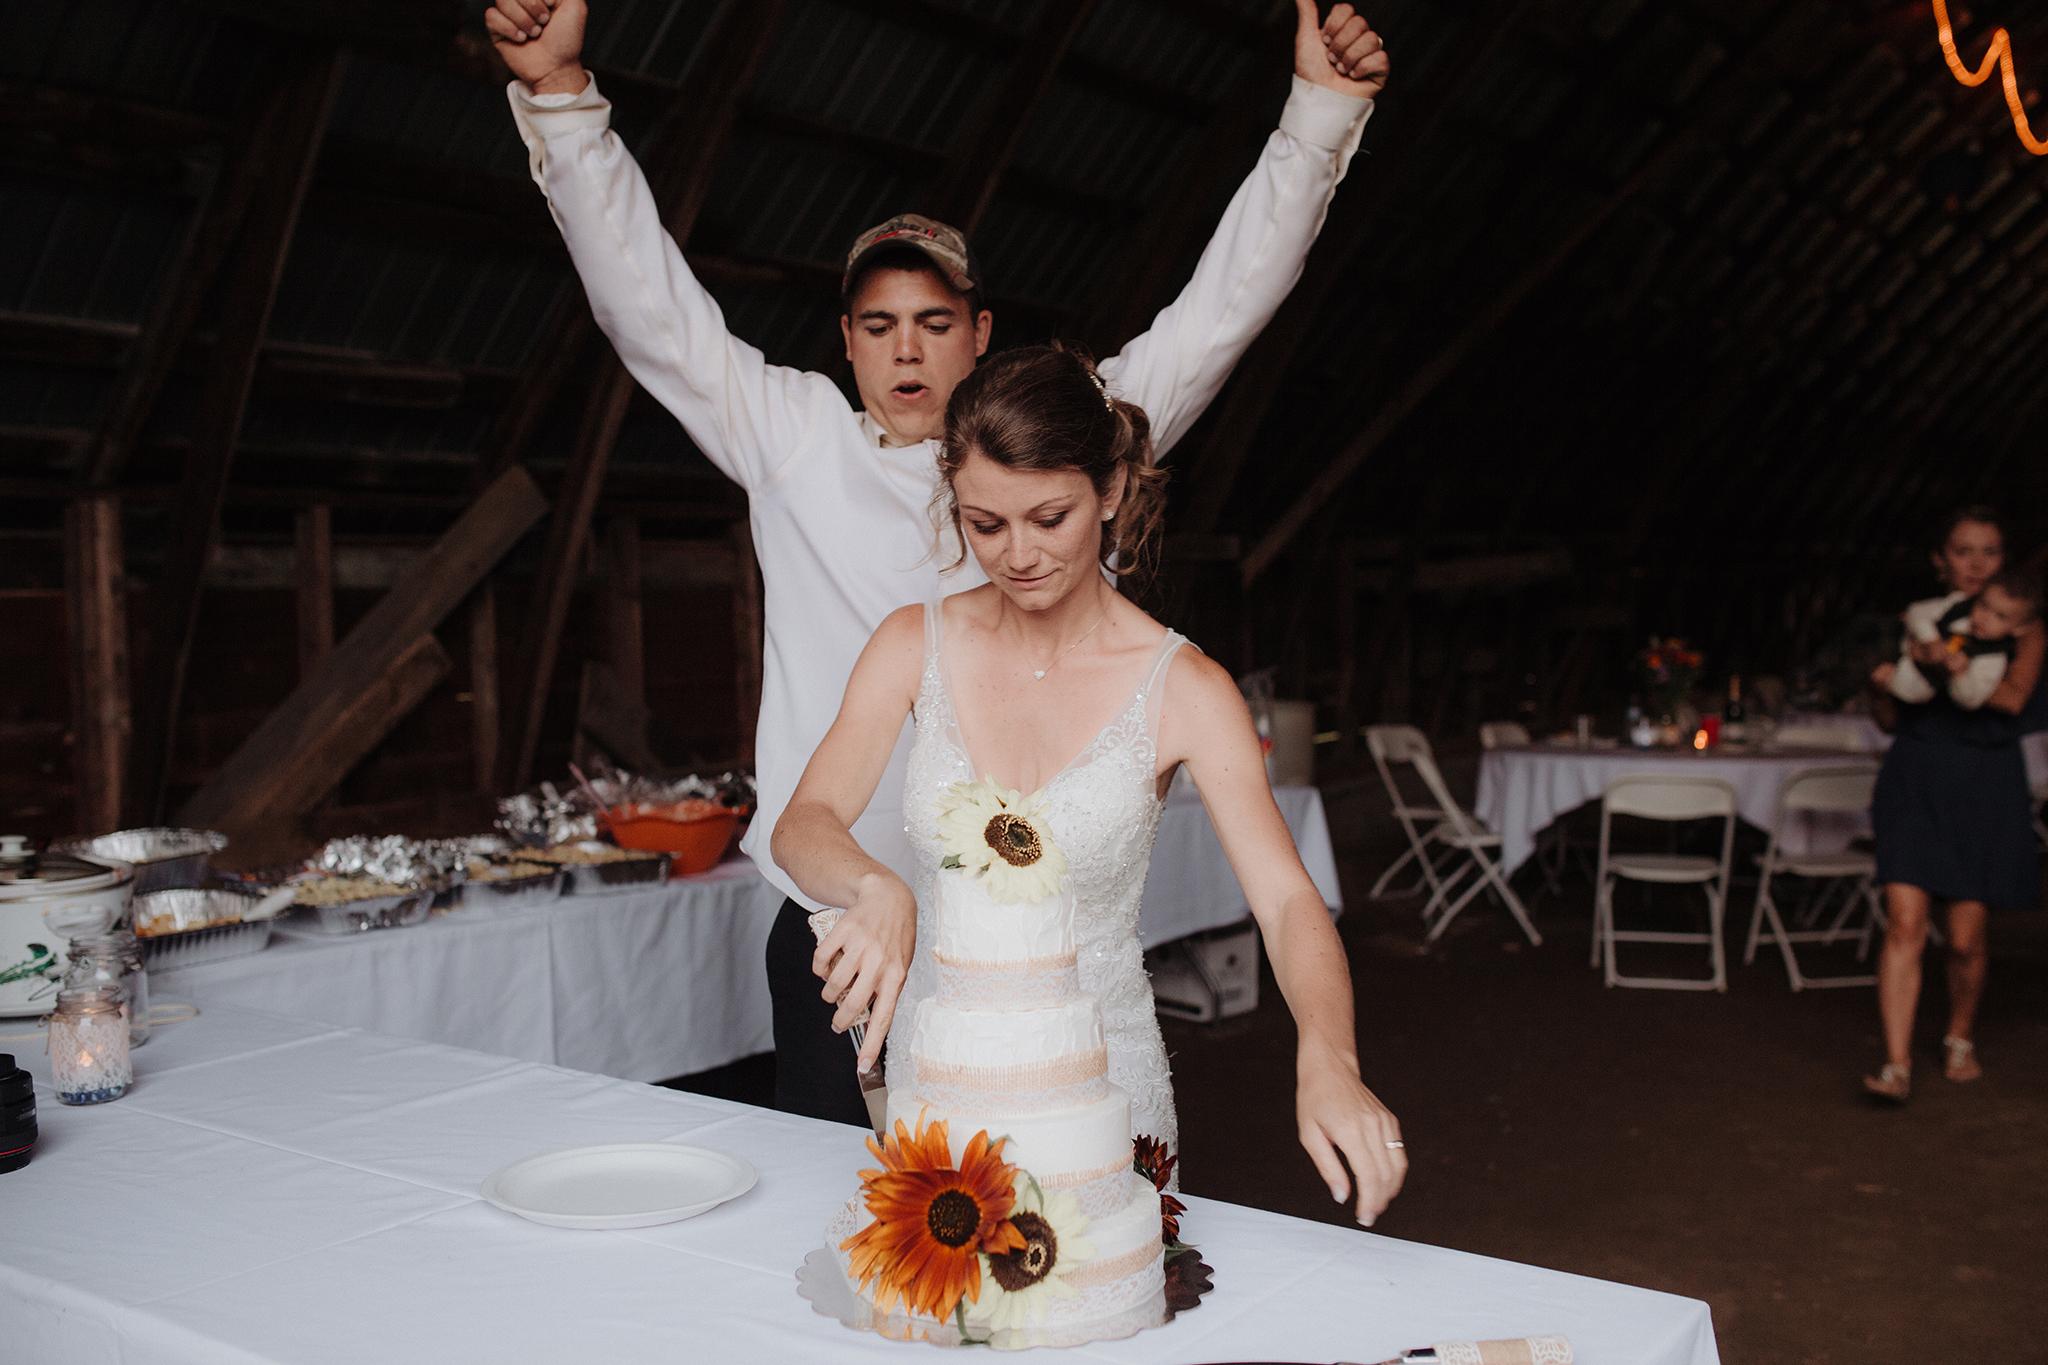 vermont-wedding-photographer-outdoor-farm-wedding-82.jpg